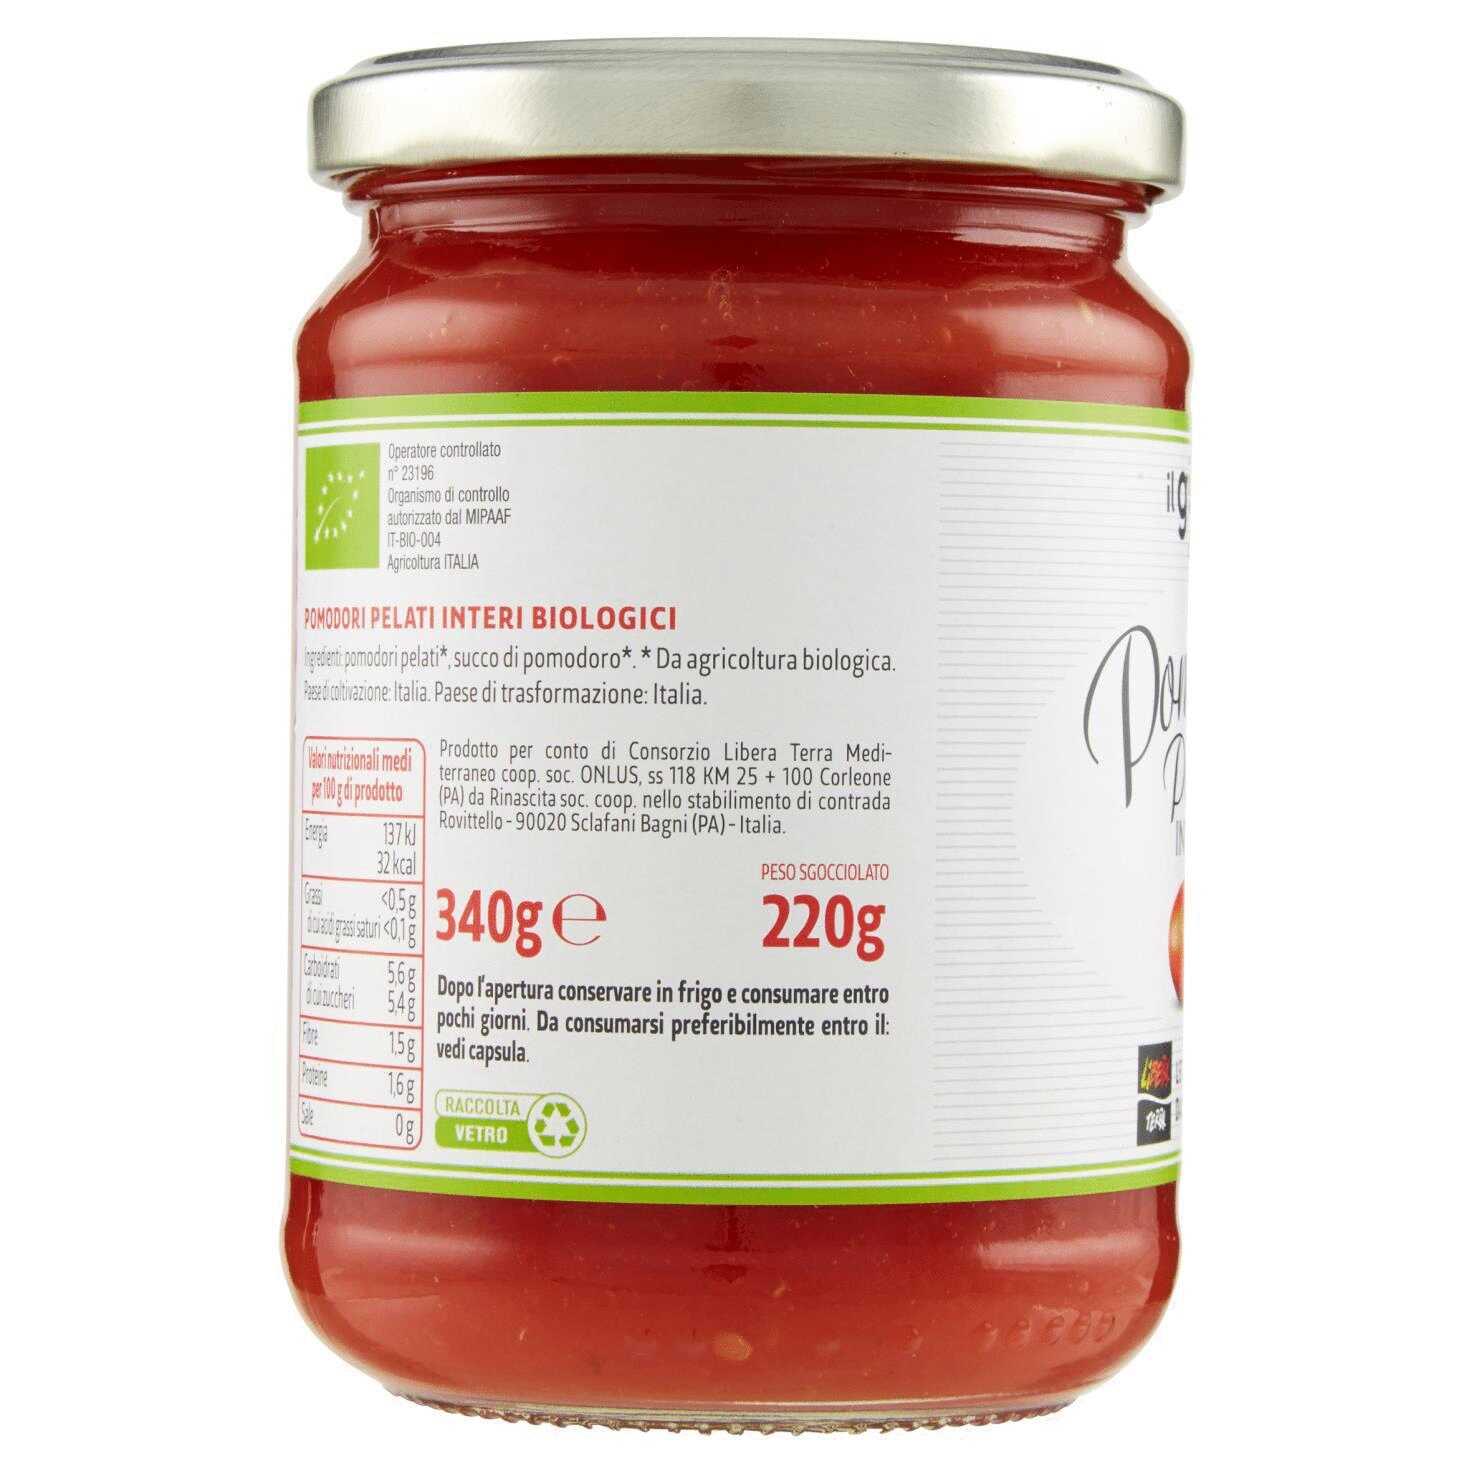 Pomodori Pelati Interi Biologici 340g